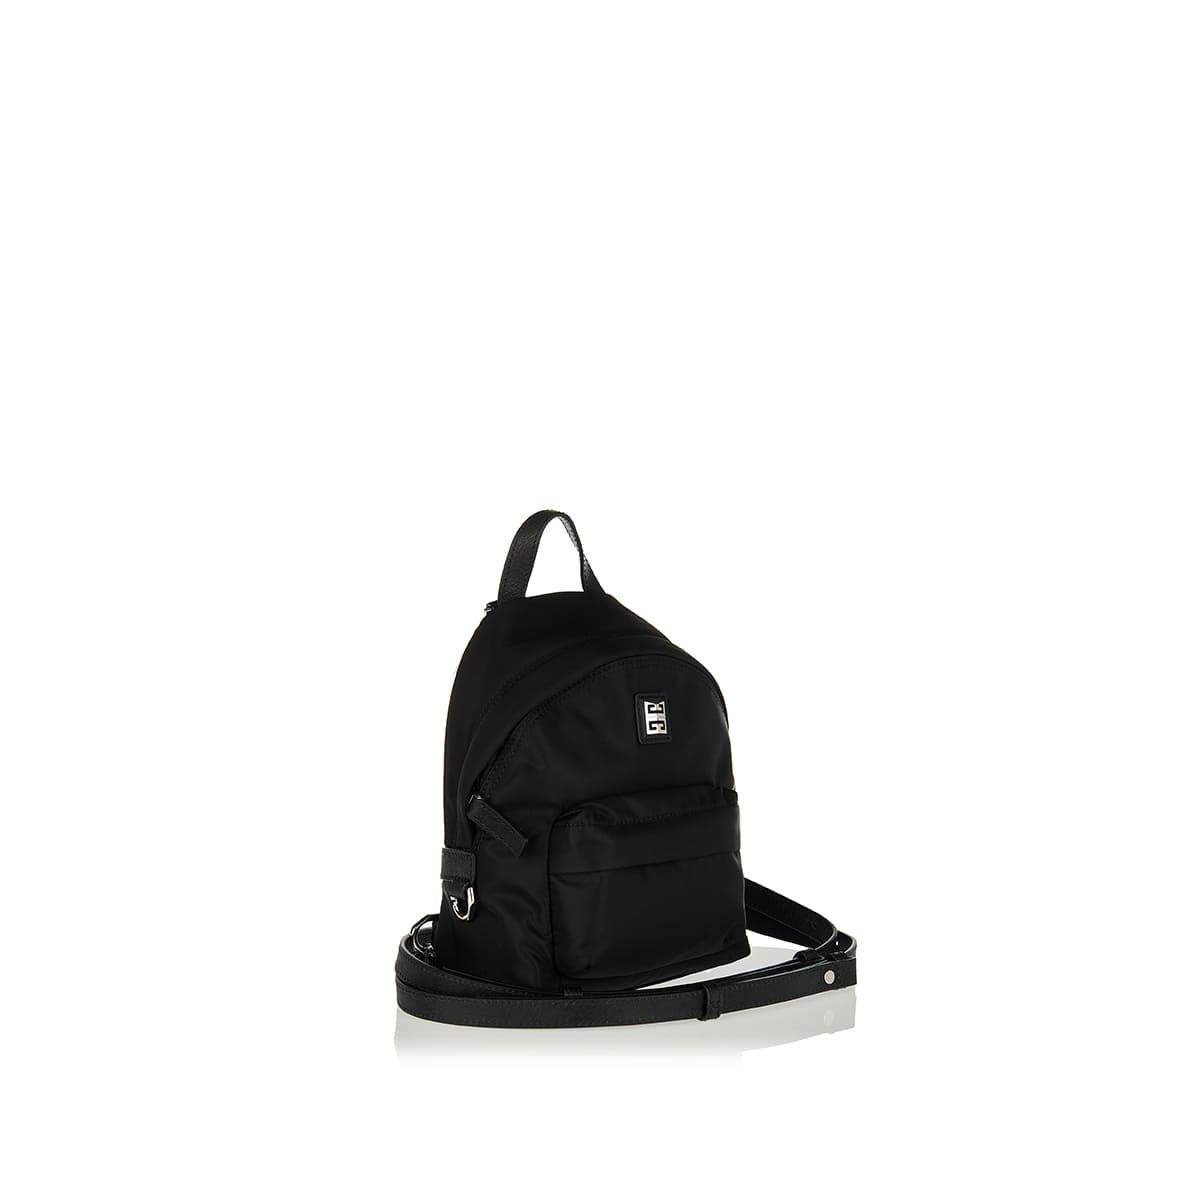 4G mini nylon backpack